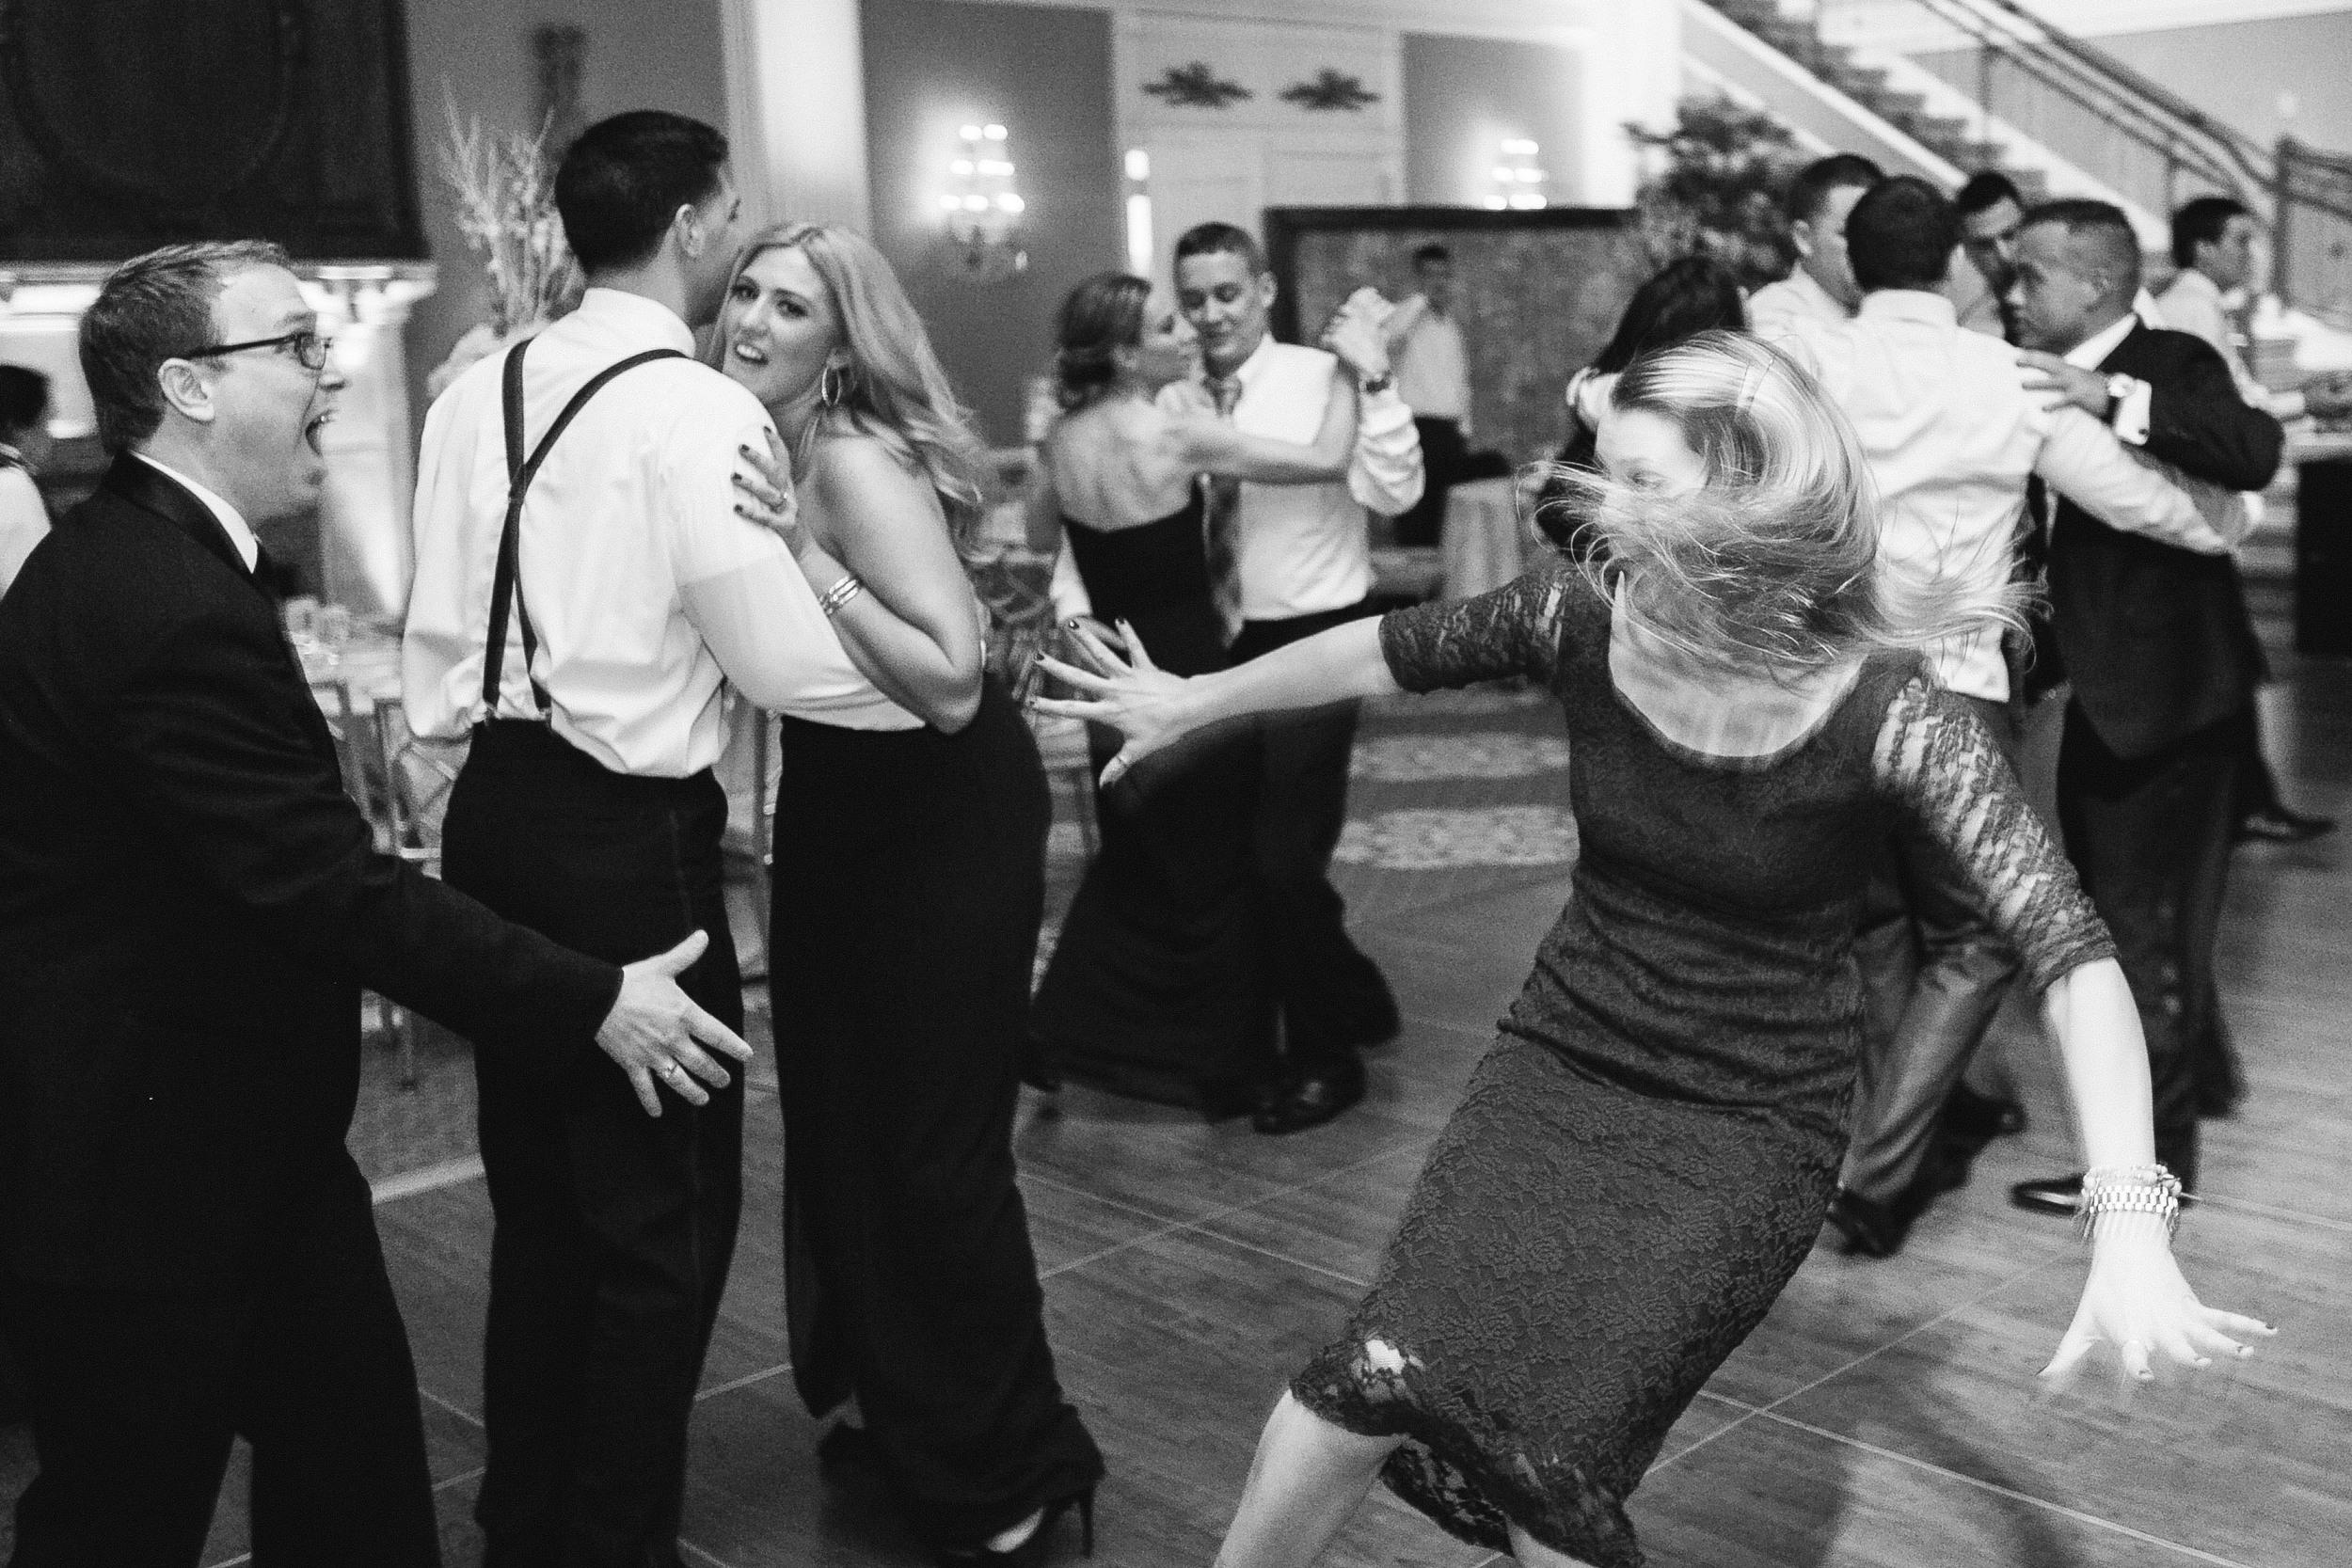 Photo-Journalistic-Wedding-Photography-by-Jacek-Dolata-CT-MA-RI-NJ-NYC-NY-VT-NH-PA-21.jpg